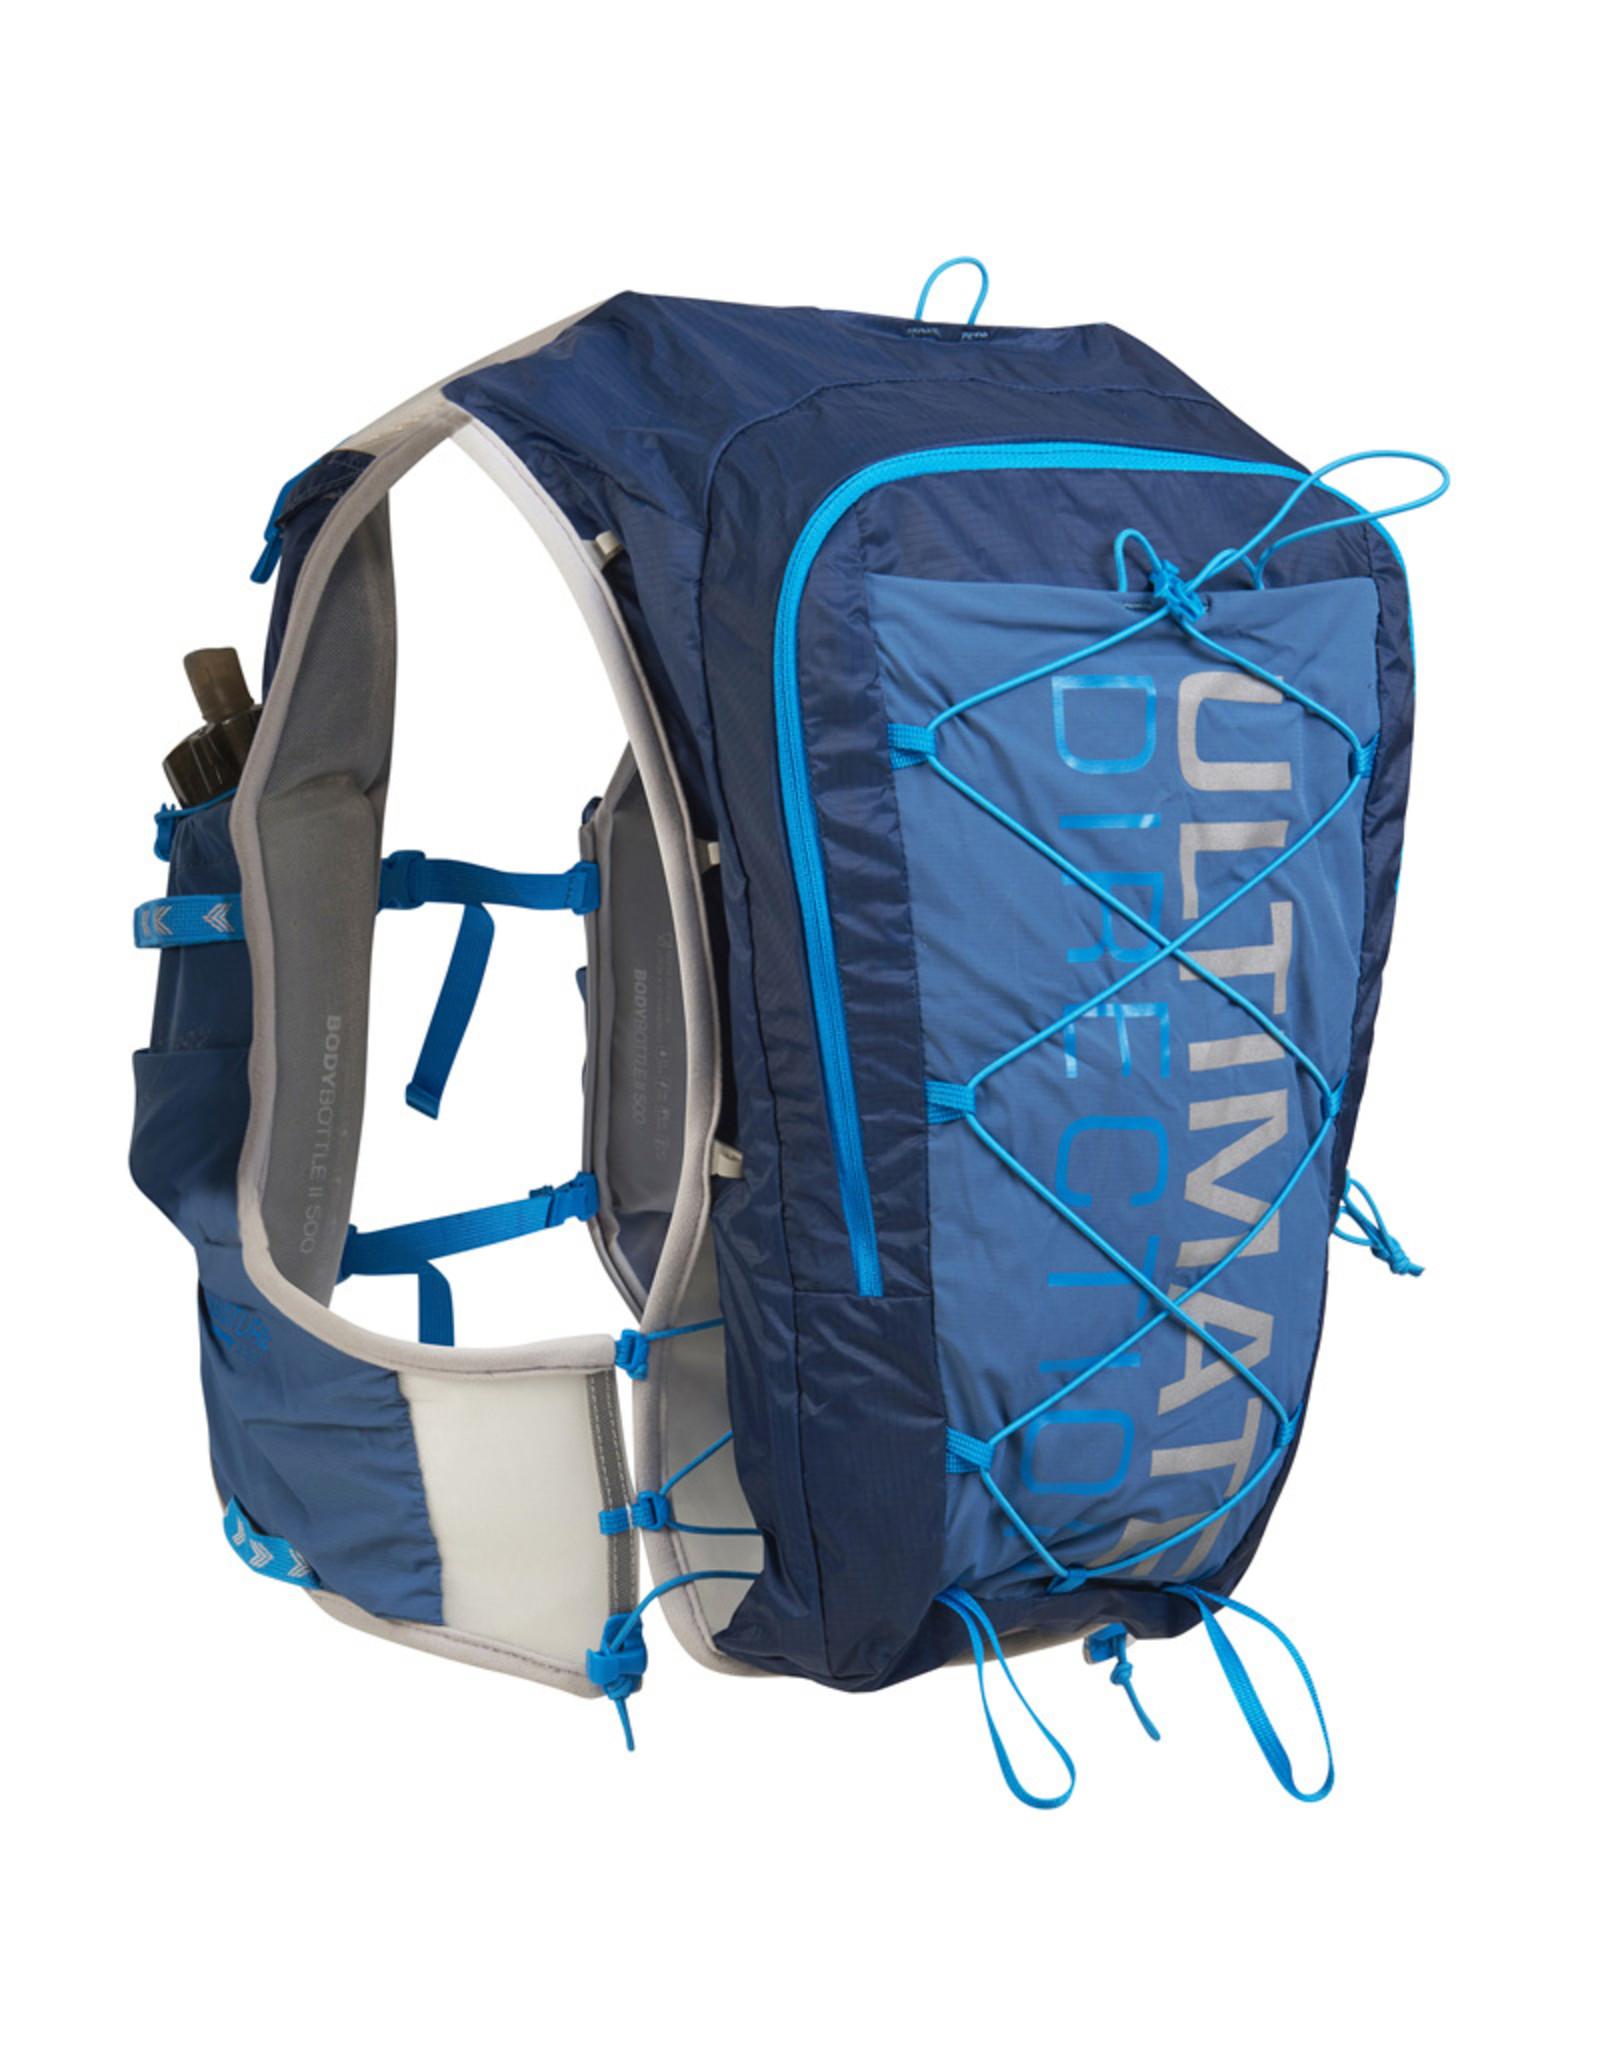 Ultimate Direction Mountain Vest 5.0 Trail Rugzak - Dusk